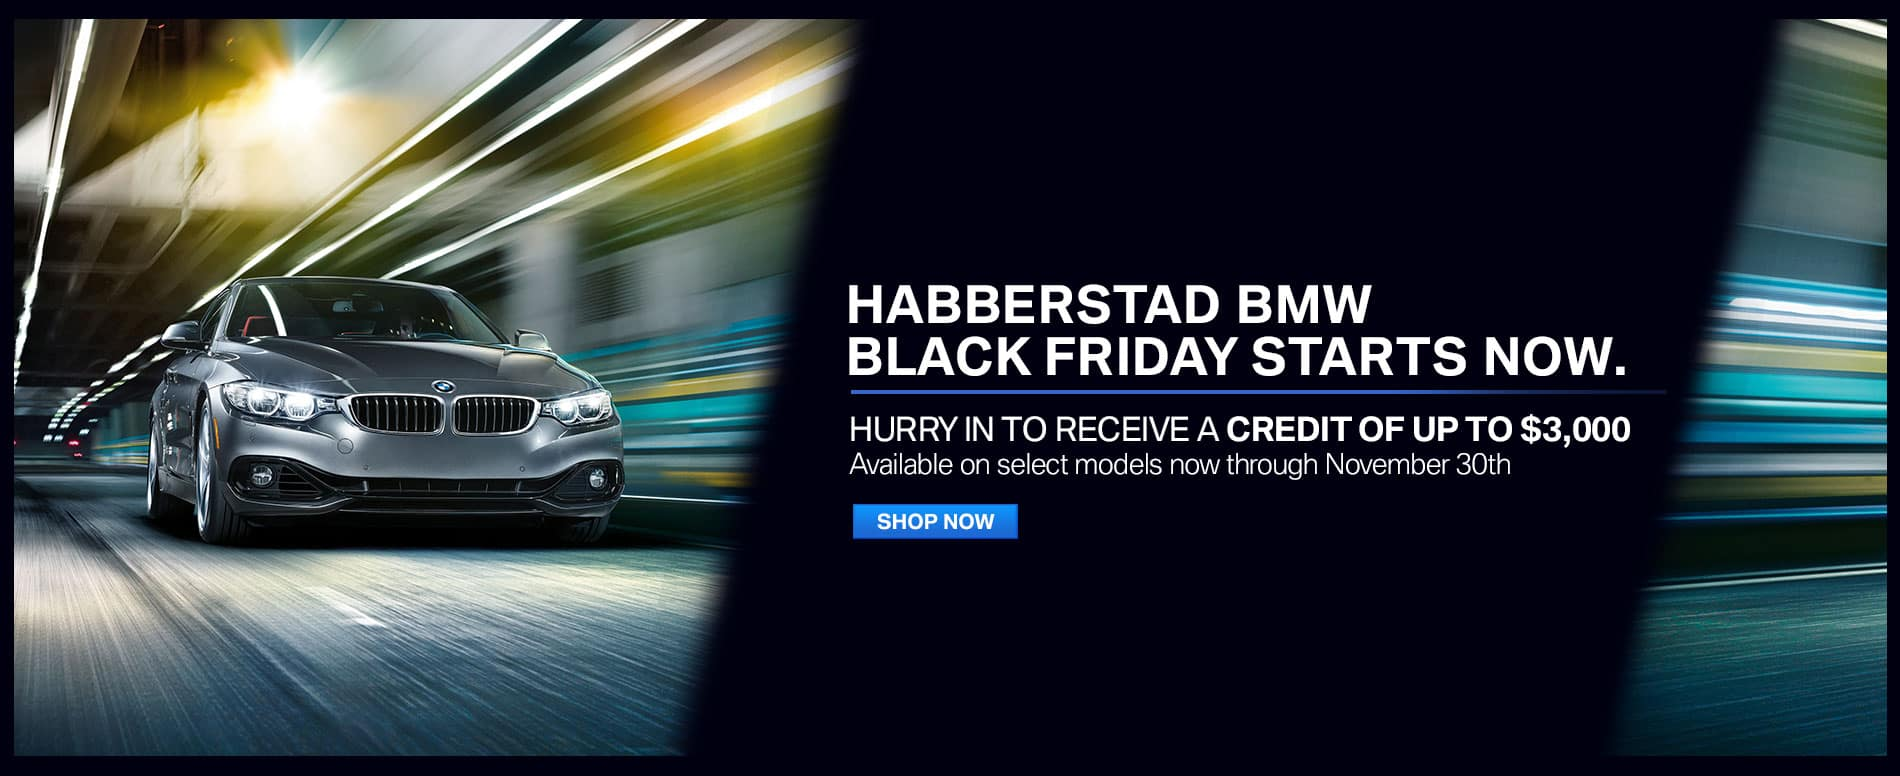 BMW Black Friday Habberstad